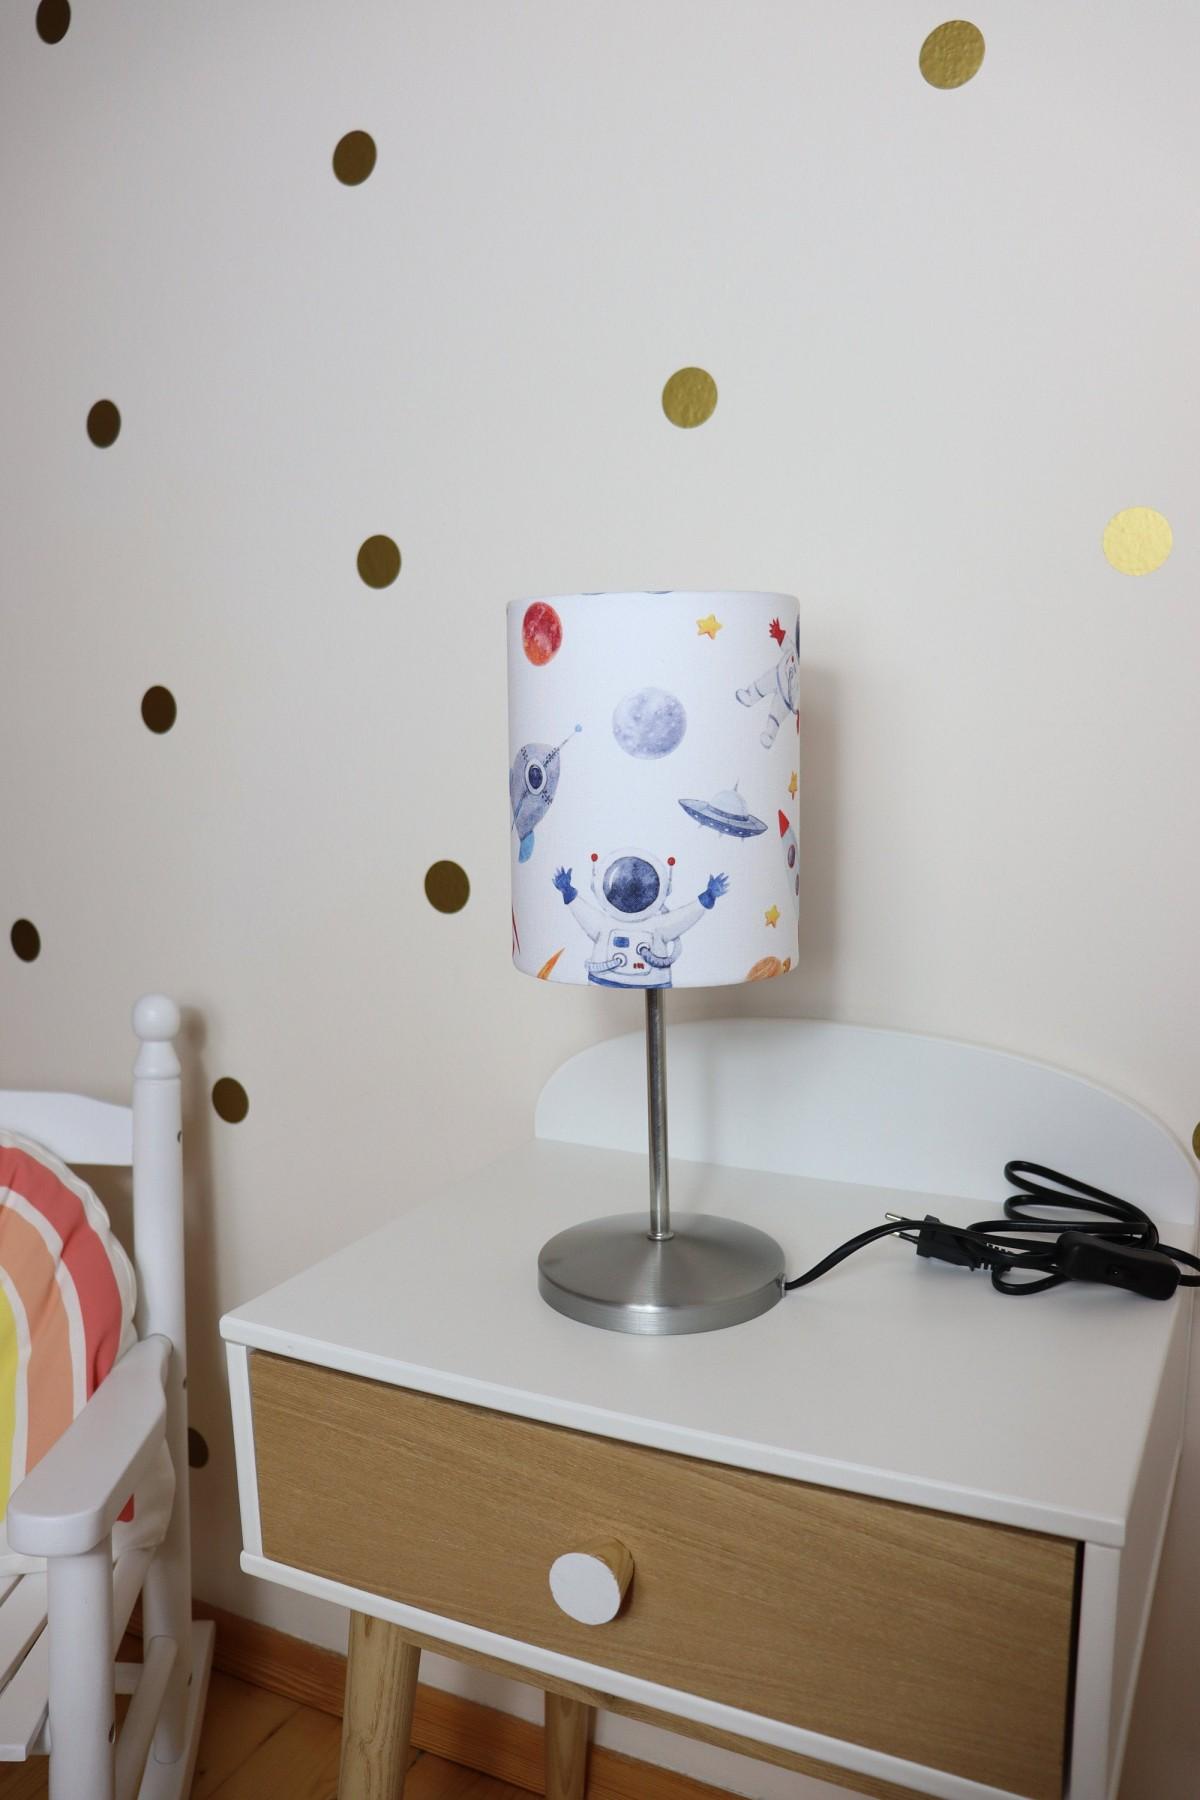 Full Size of Kinderzimmer Wanddeko Tikinderzimmer Deko Weltraum Kinderlampe Raketen Online Regal Weiß Küche Sofa Regale Kinderzimmer Kinderzimmer Wanddeko